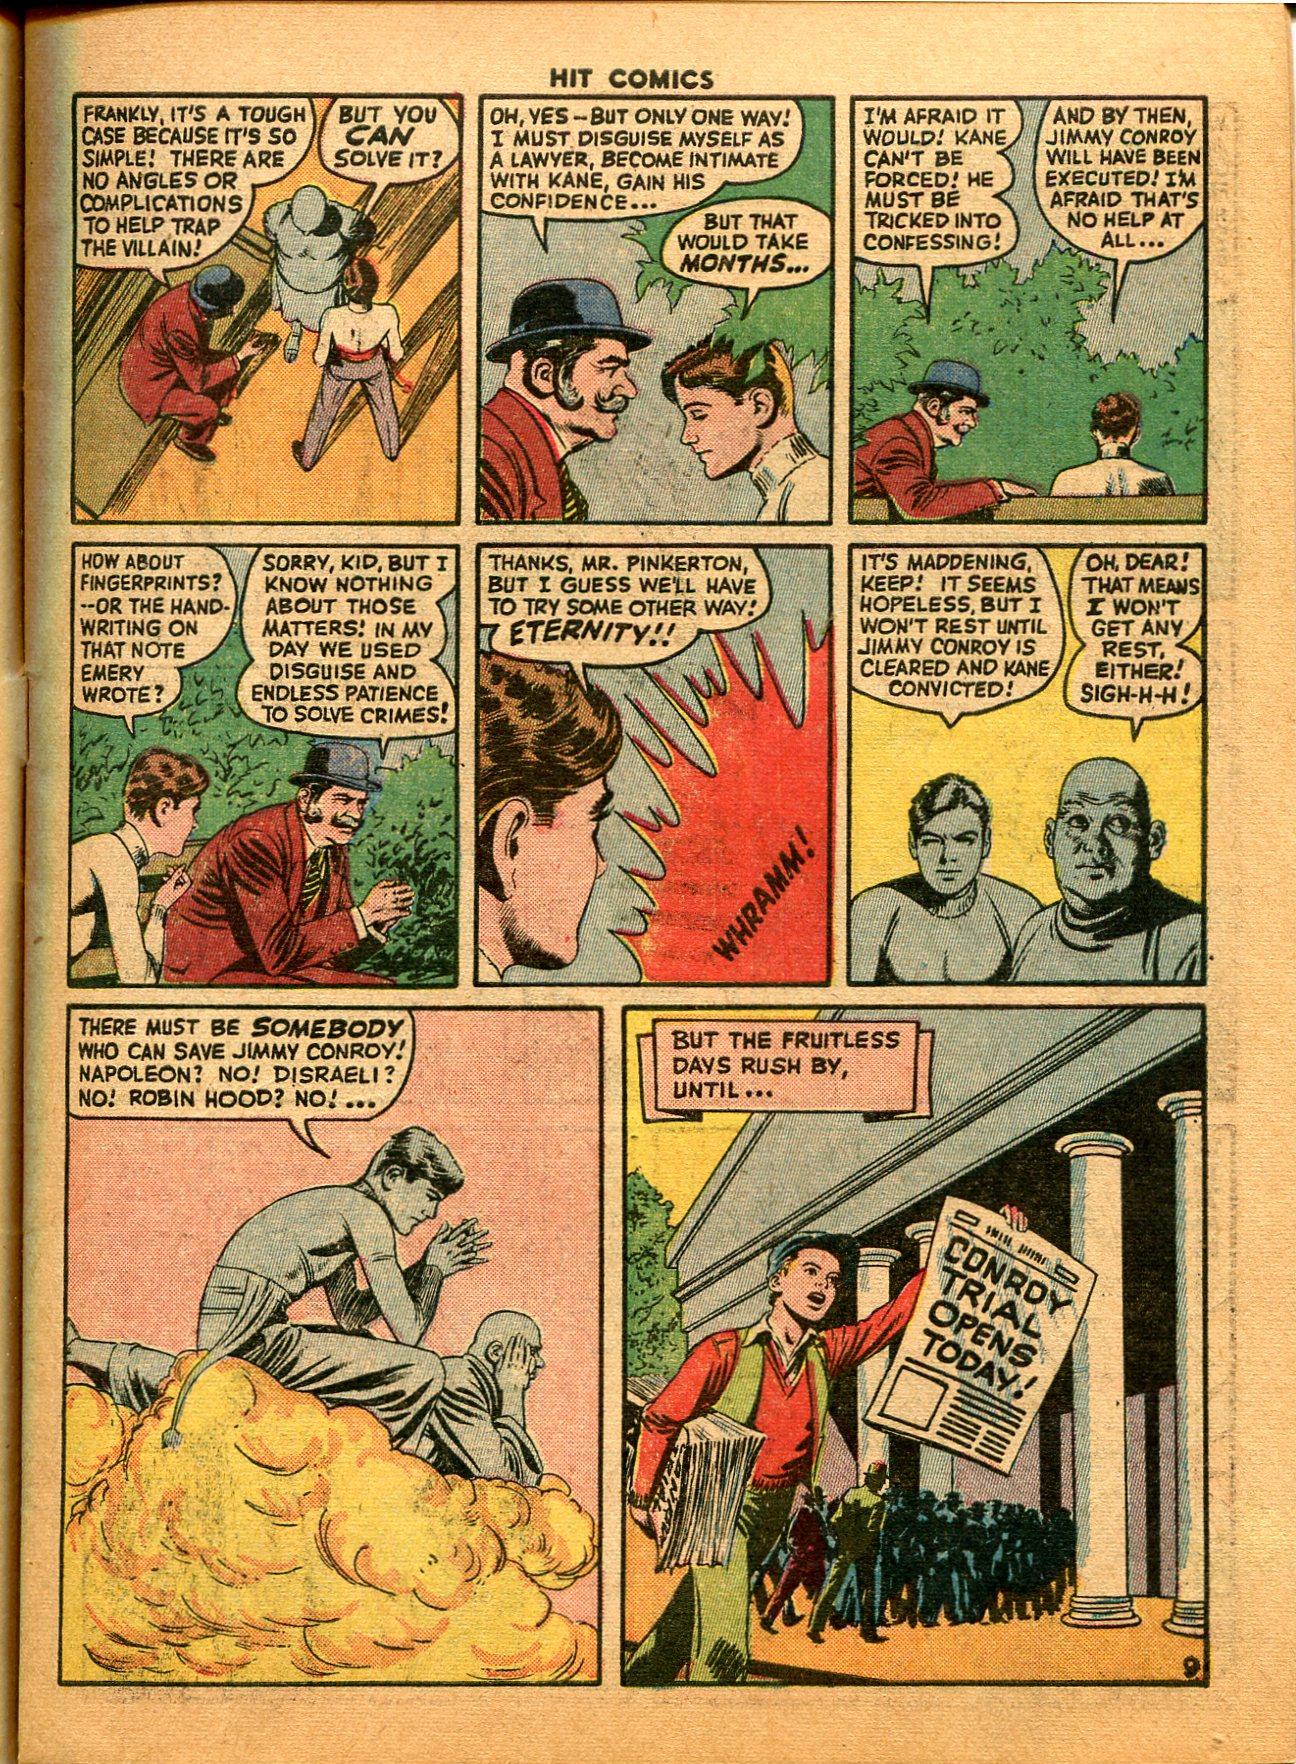 Read online Hit Comics comic -  Issue #35 - 11